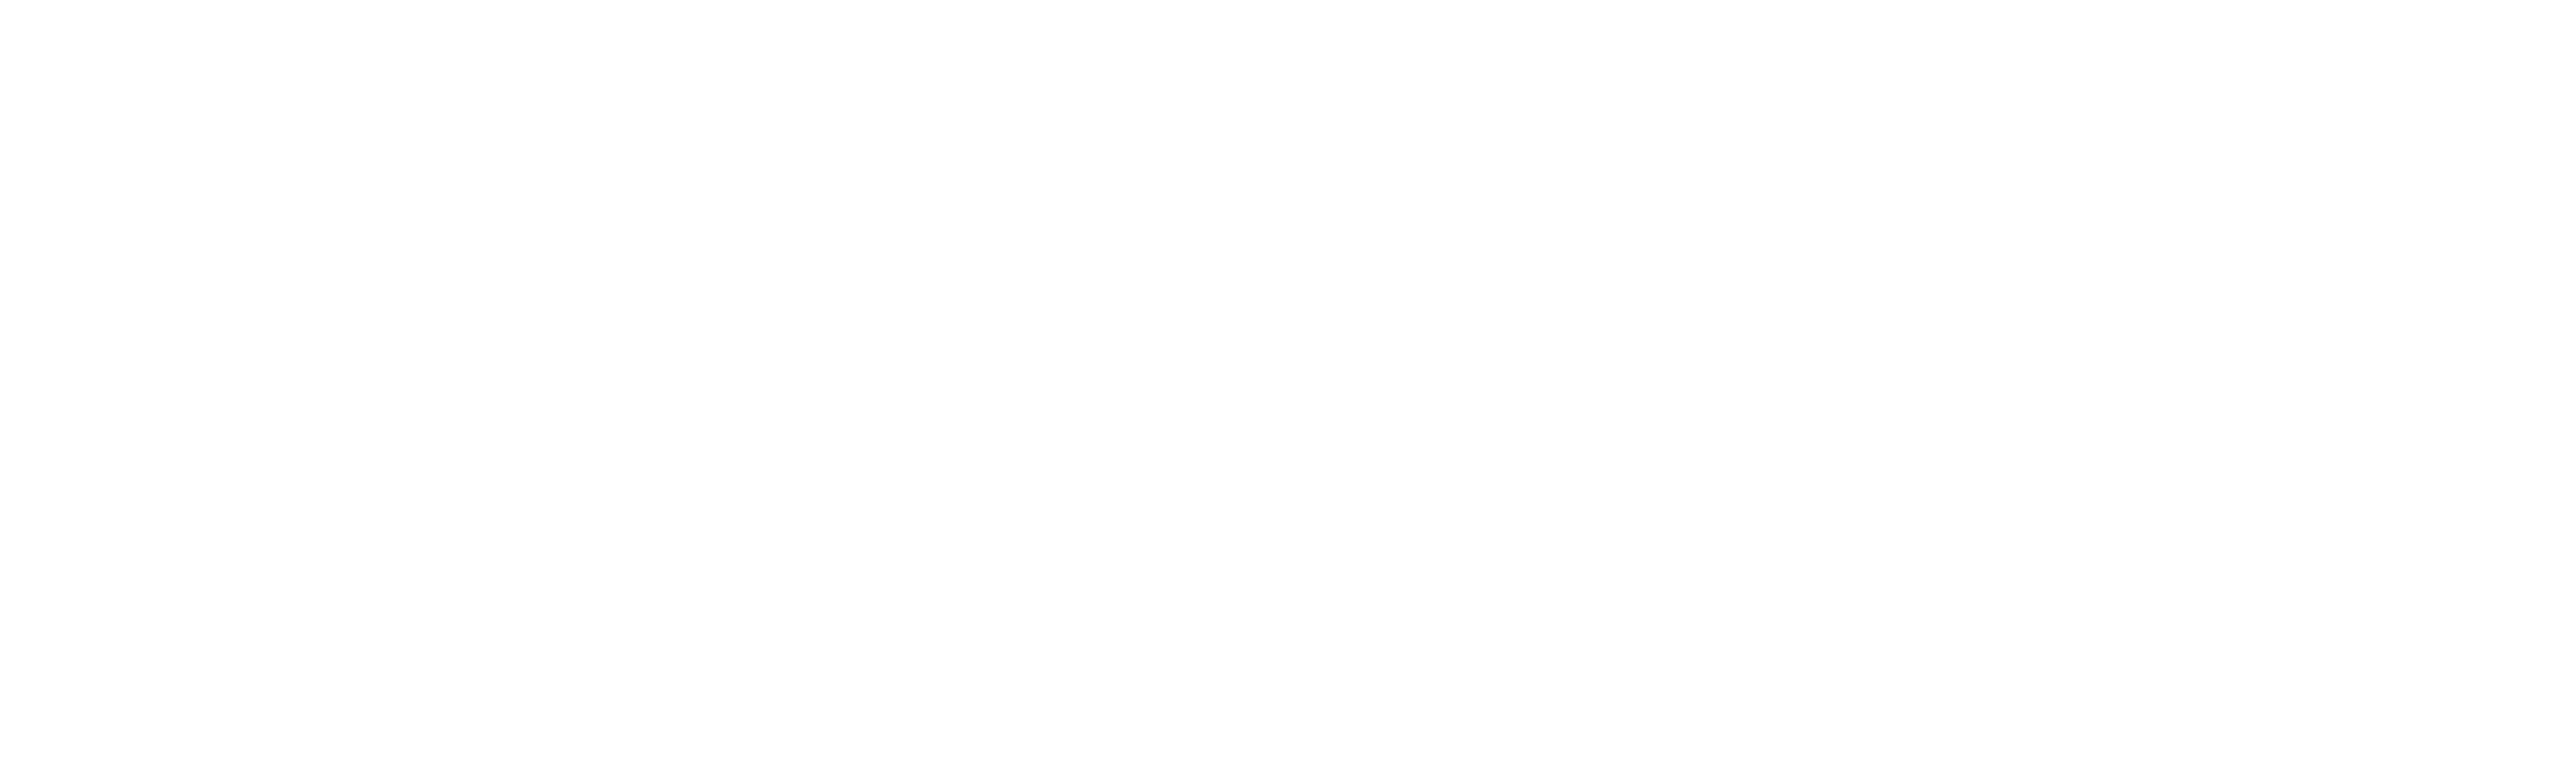 Bebop 3 - White